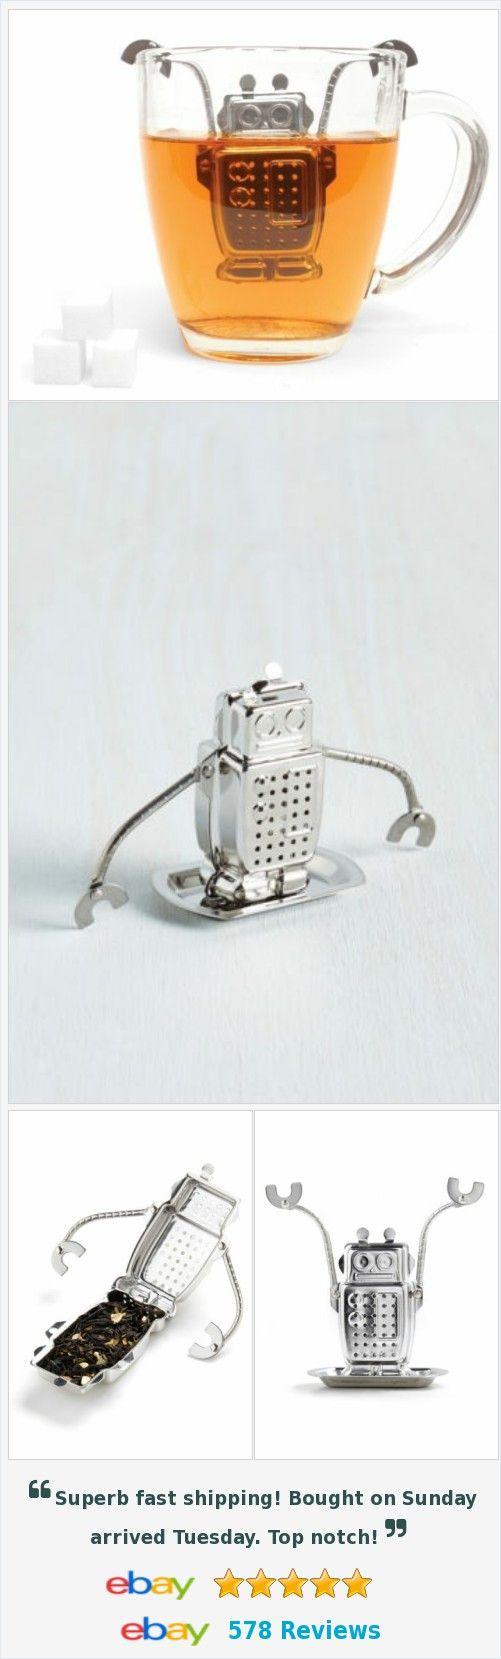 Robot Stainless Steel Tea Infuser Tea Brewer Novelty Gifts Creative Design http://www.ebay.com/itm/Robot-Stainless-Steel-Tea-Infuser-Tea-Brewer-Novelty-Gifts-Creative-Design-/172243942579?